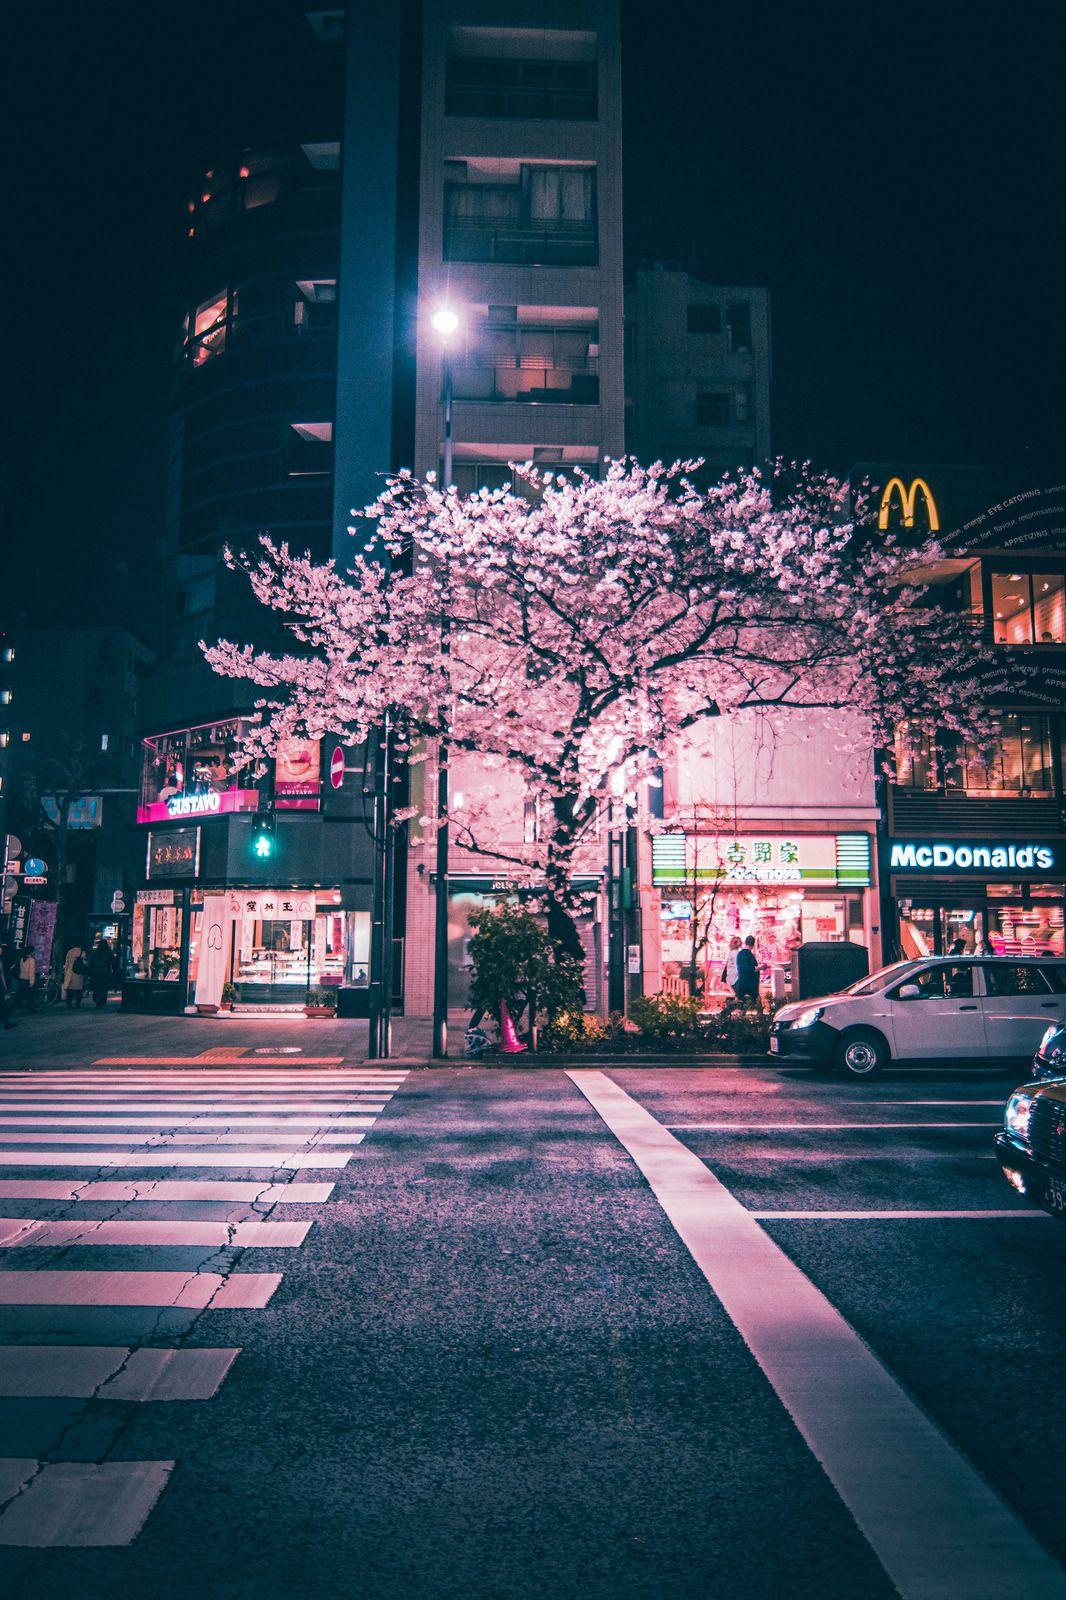 Chuo   Tokyo Japan Aesthetic japan Sky aesthetic City aesthetic 1066x1600